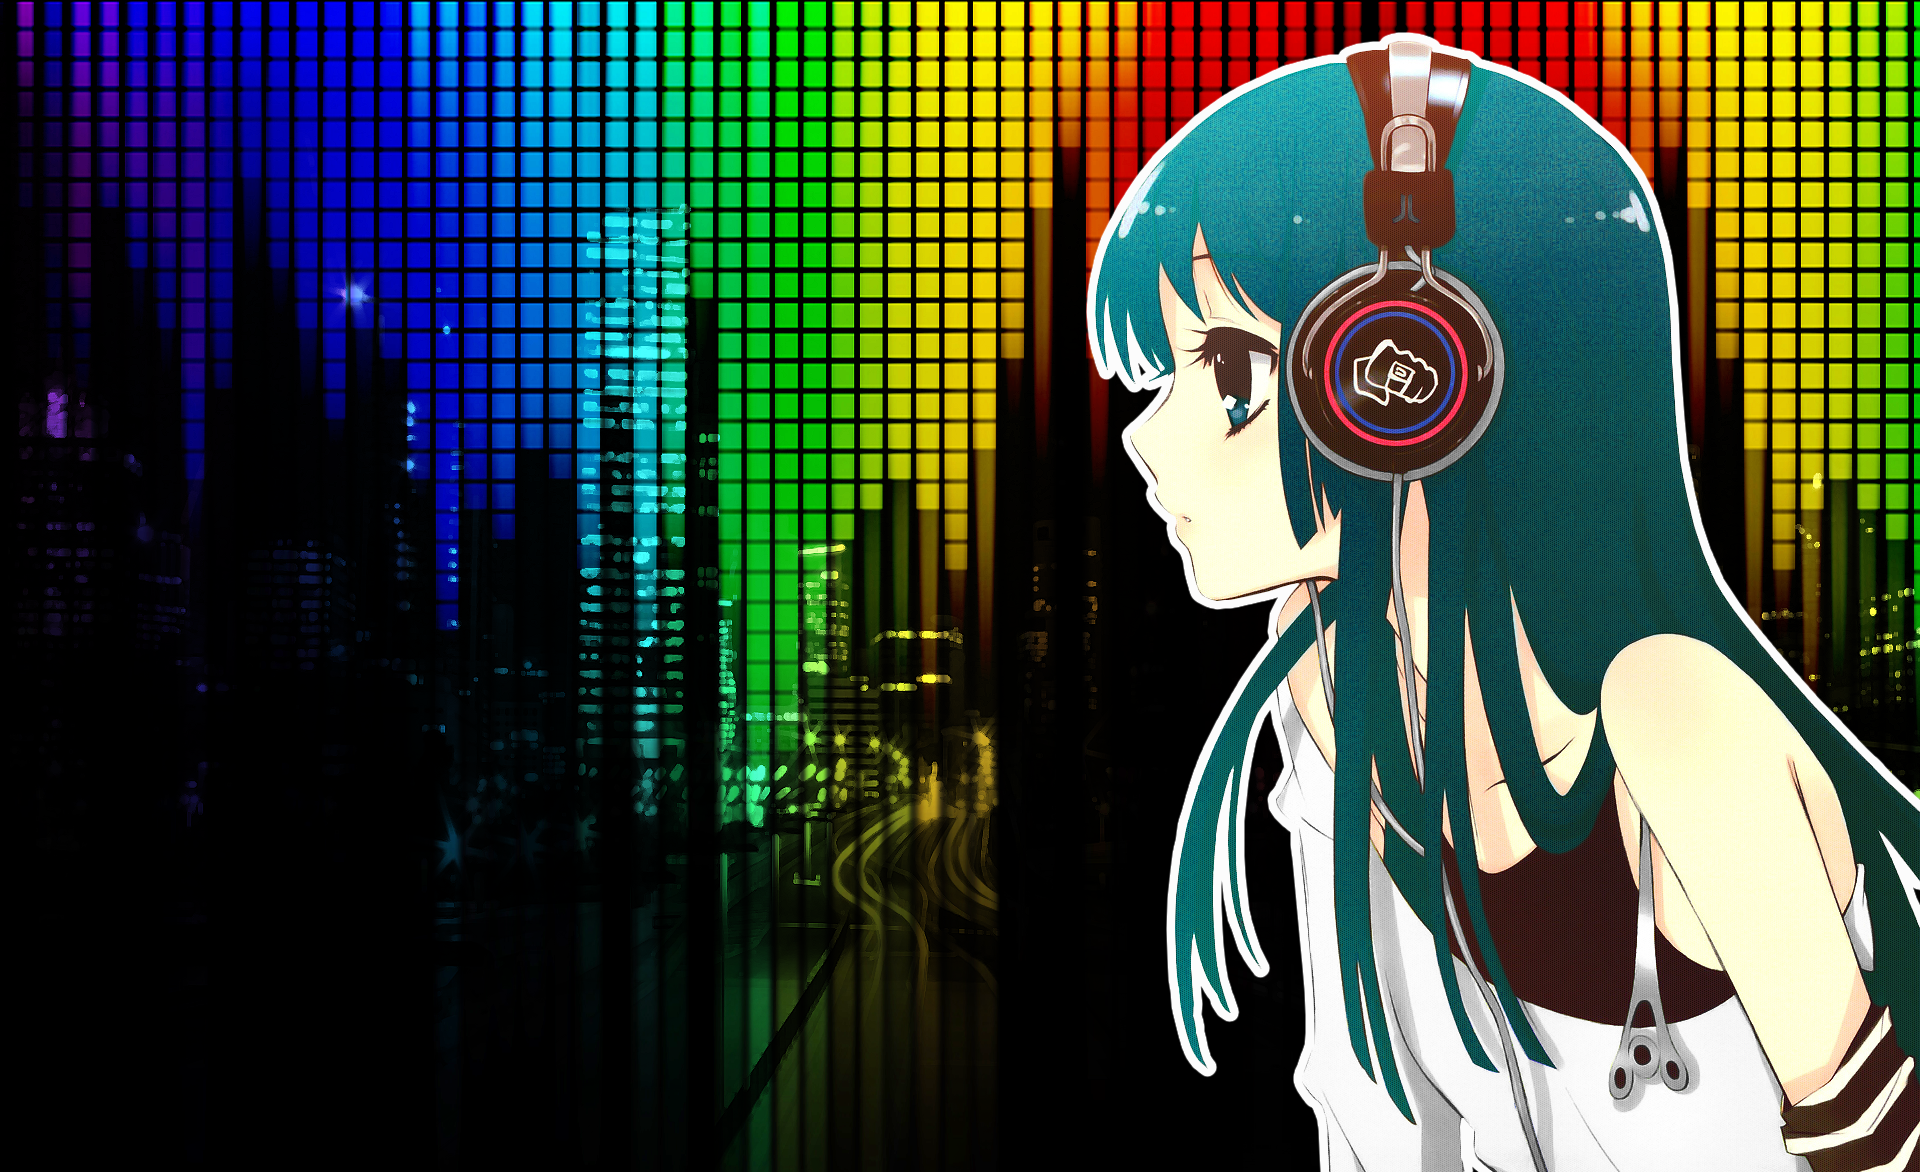 76 anime music wallpaper on wallpapersafari - Anime wallpaper music ...